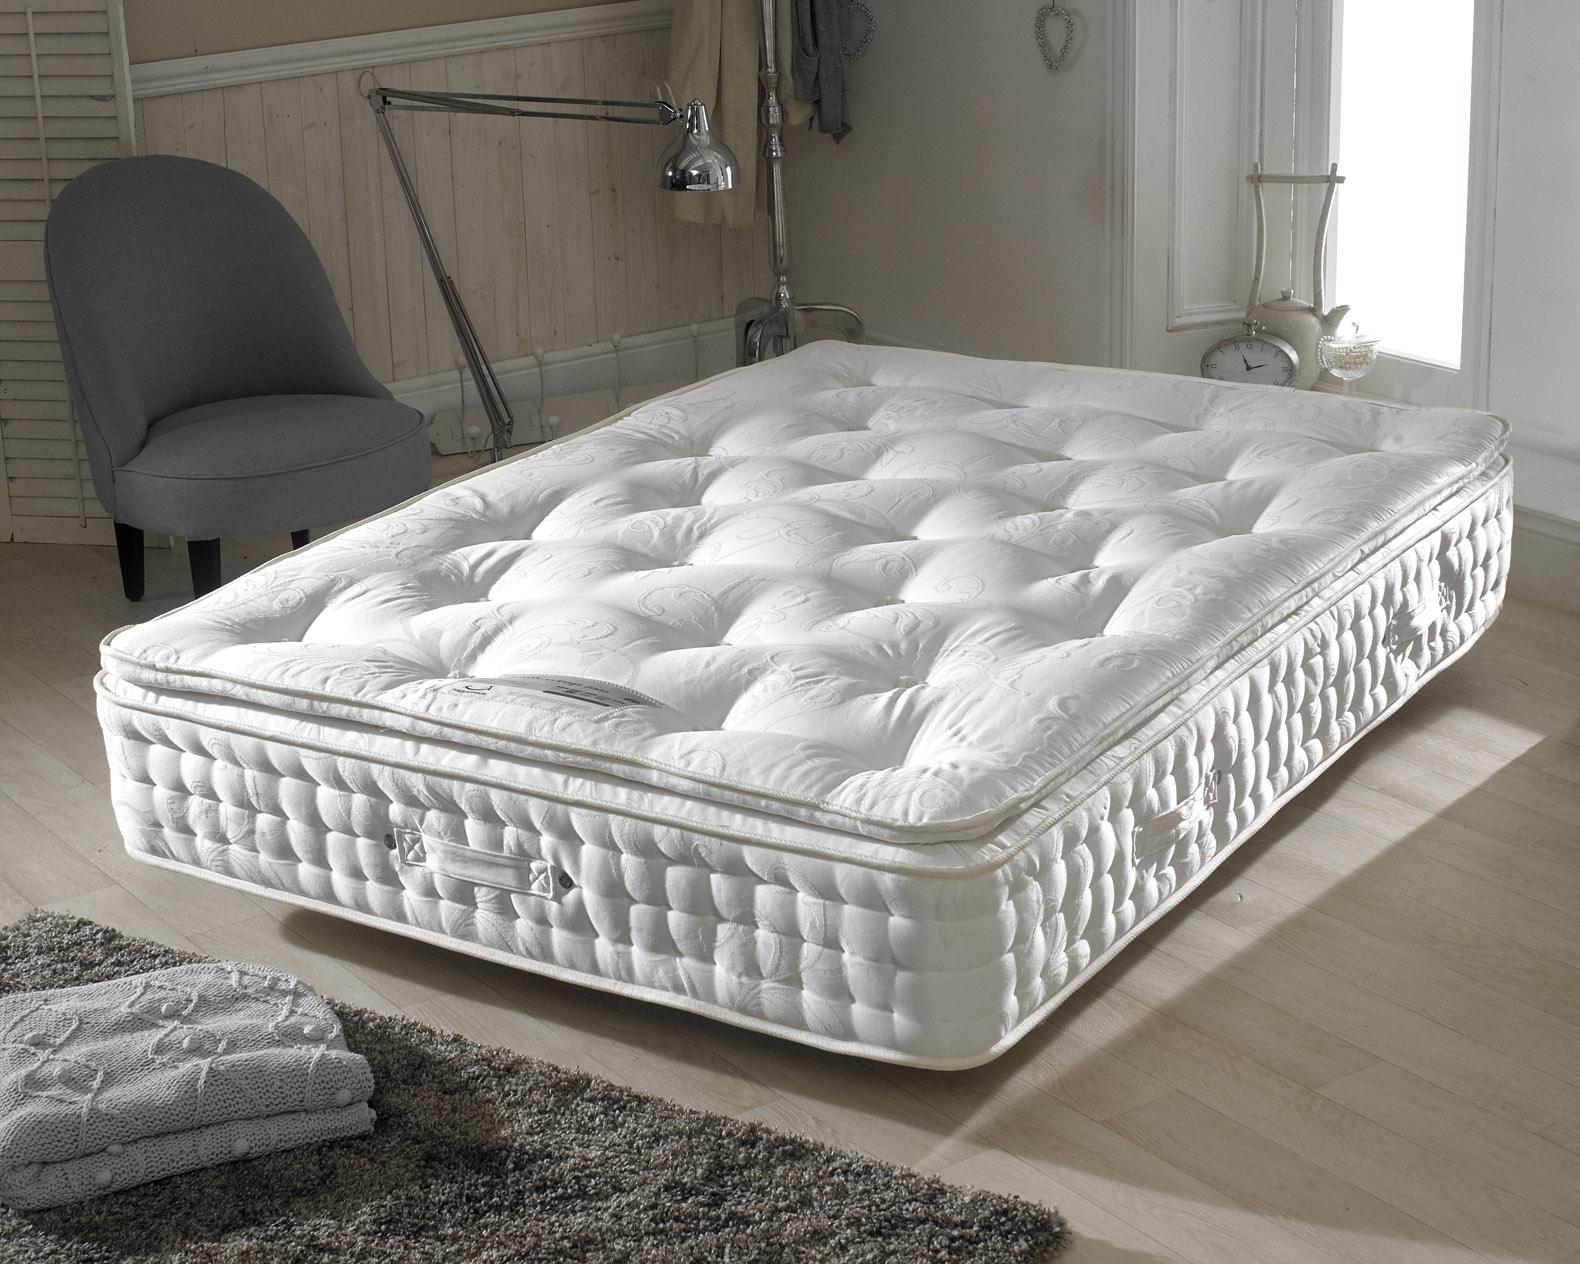 pillow top sofa bed mattress pad queen sleeper dimensions happy beds signature 2000 natural pocket sprung pillowtop